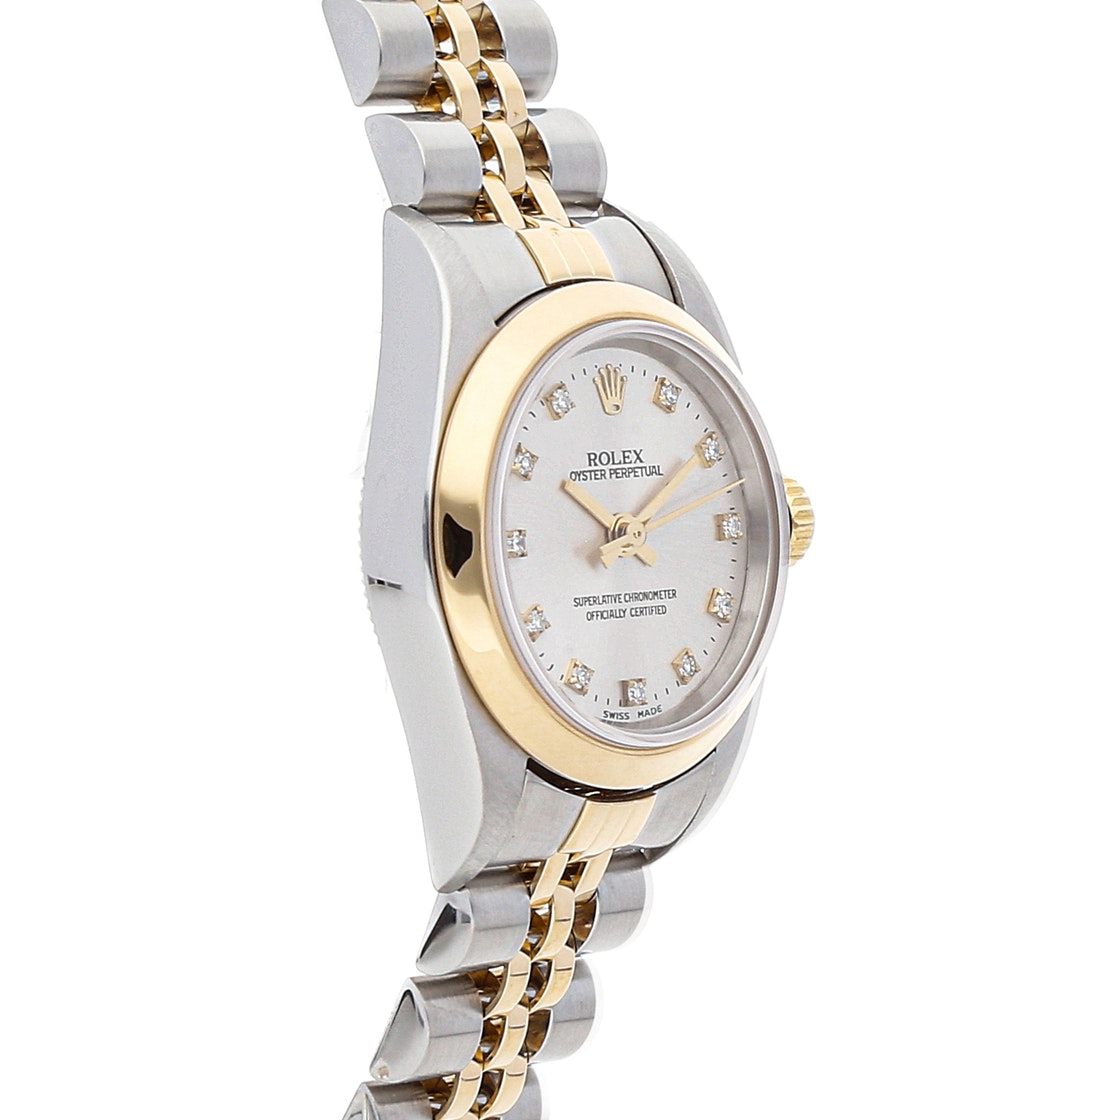 Rolex Datejust 76183